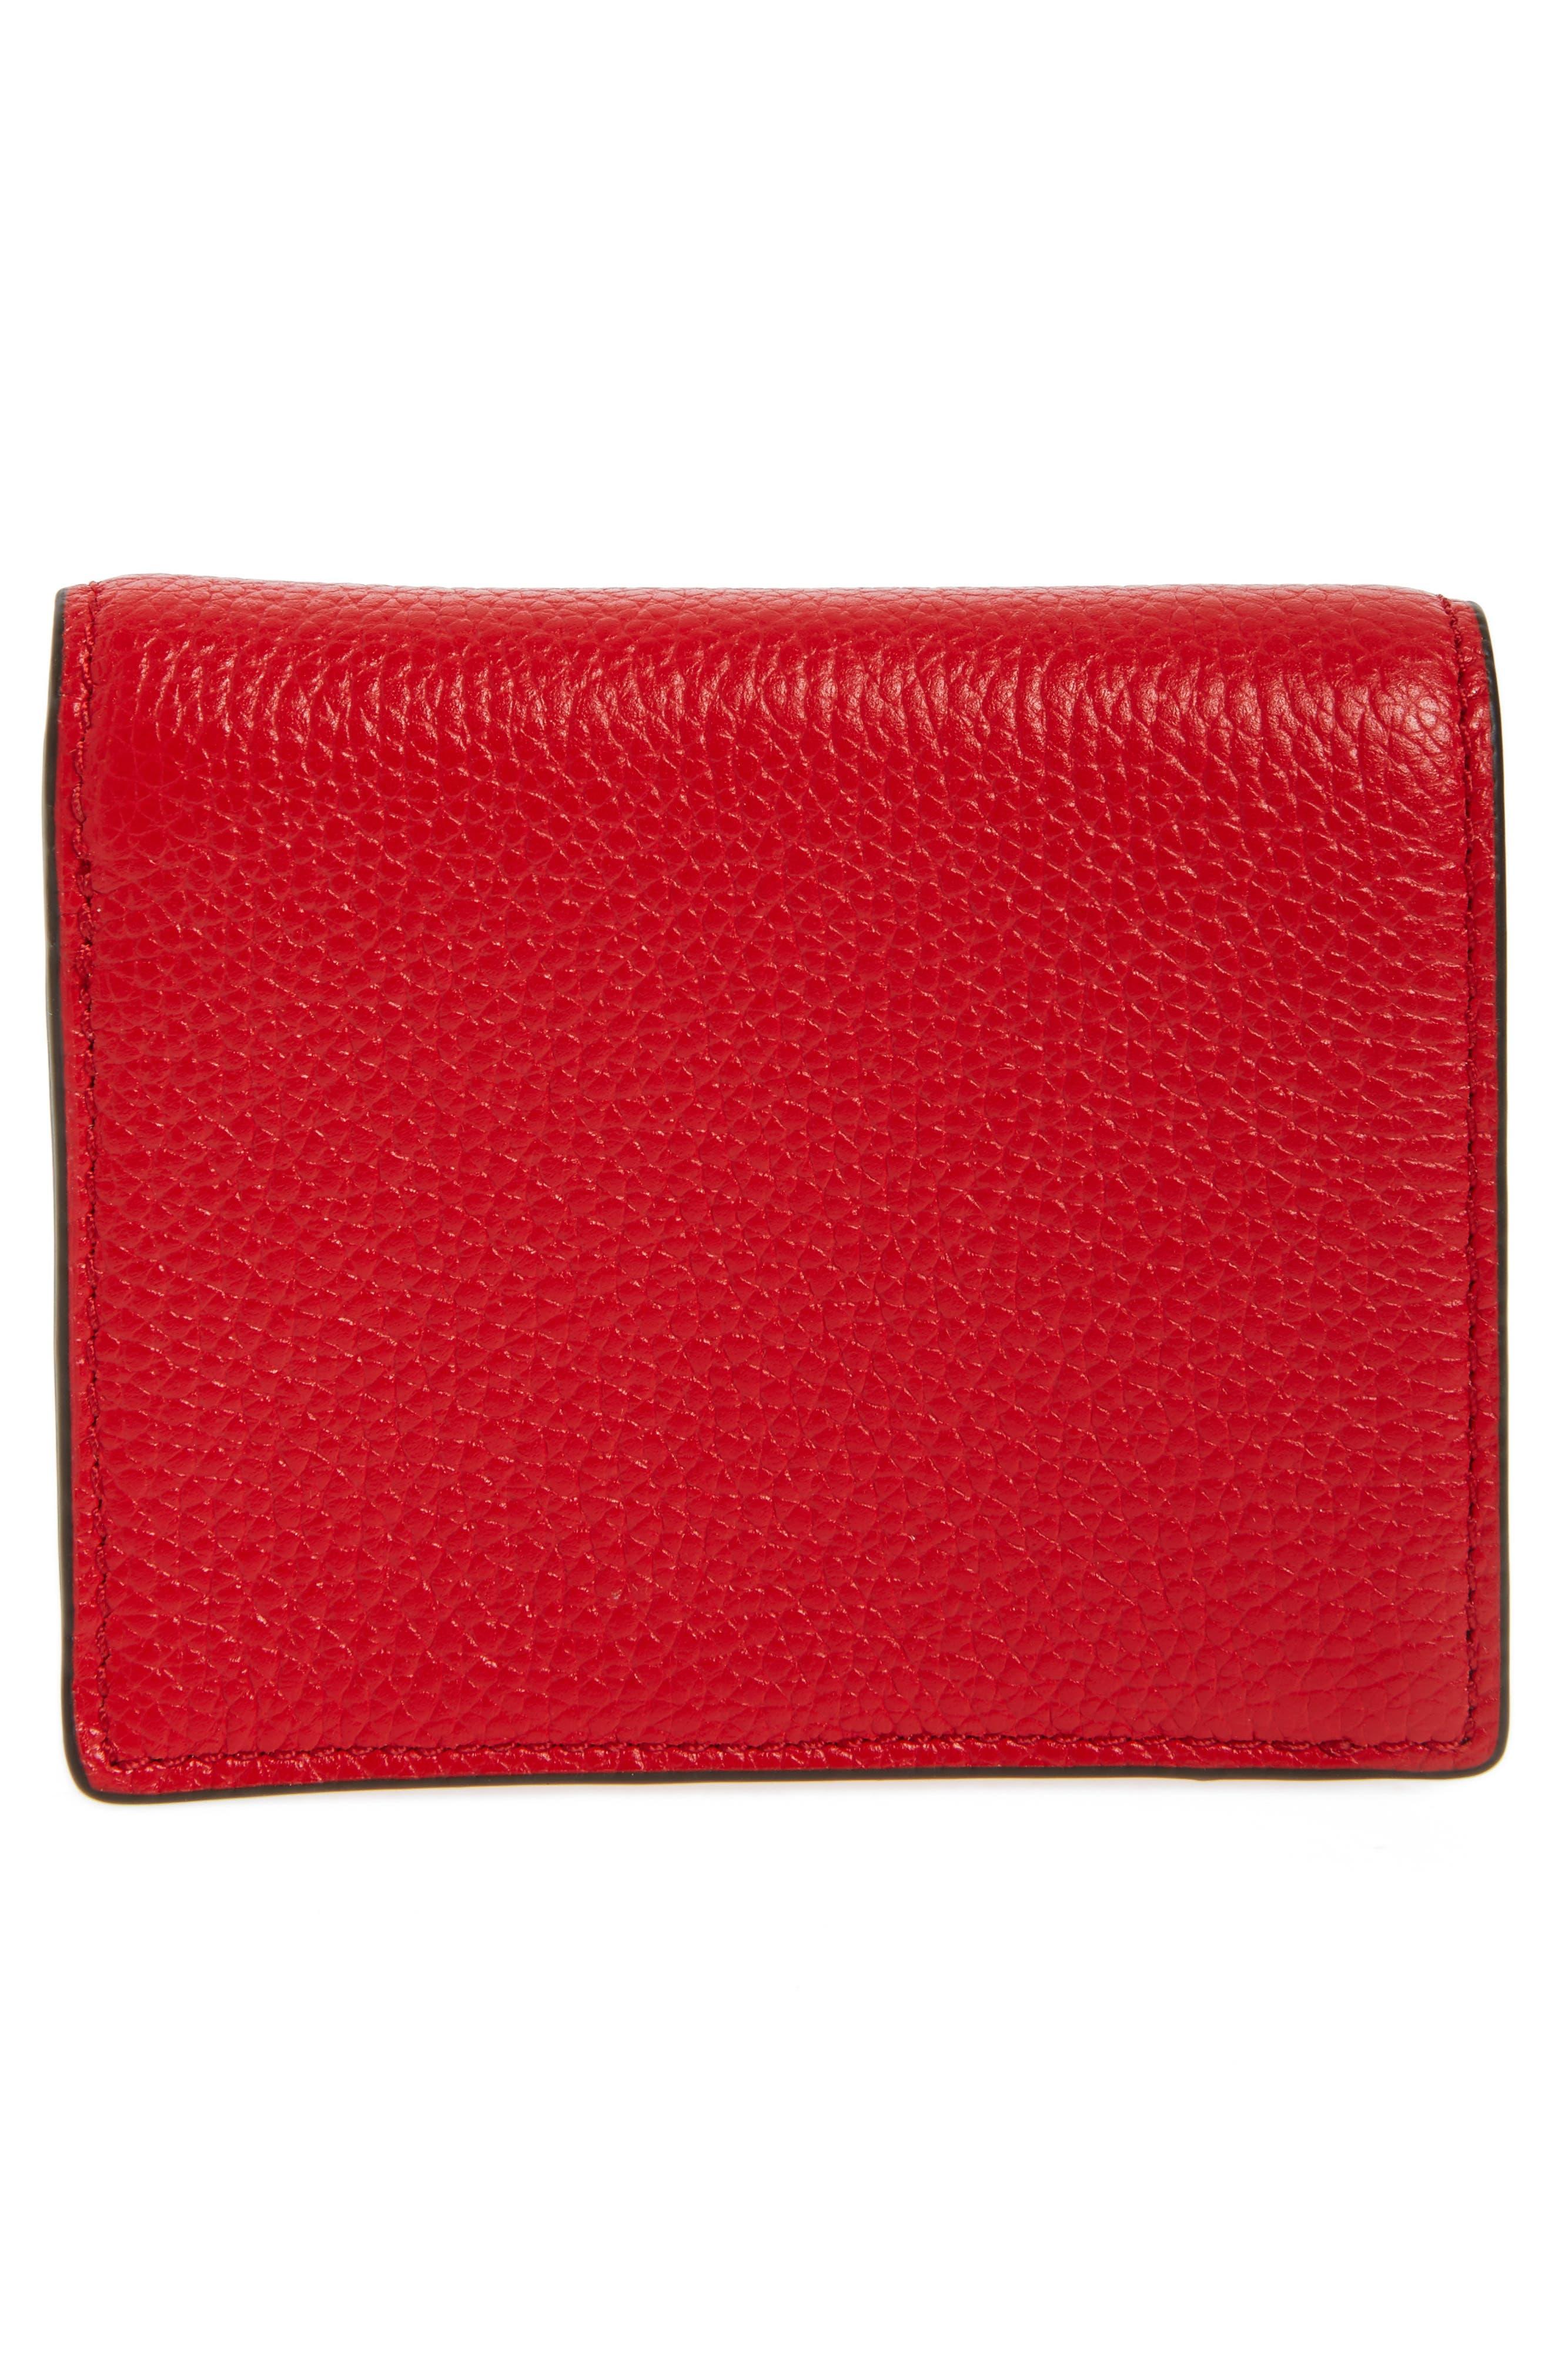 Alternate Image 4  - MICHAEL Michael Kors Mercer Leather RFID Cardholder Wallet